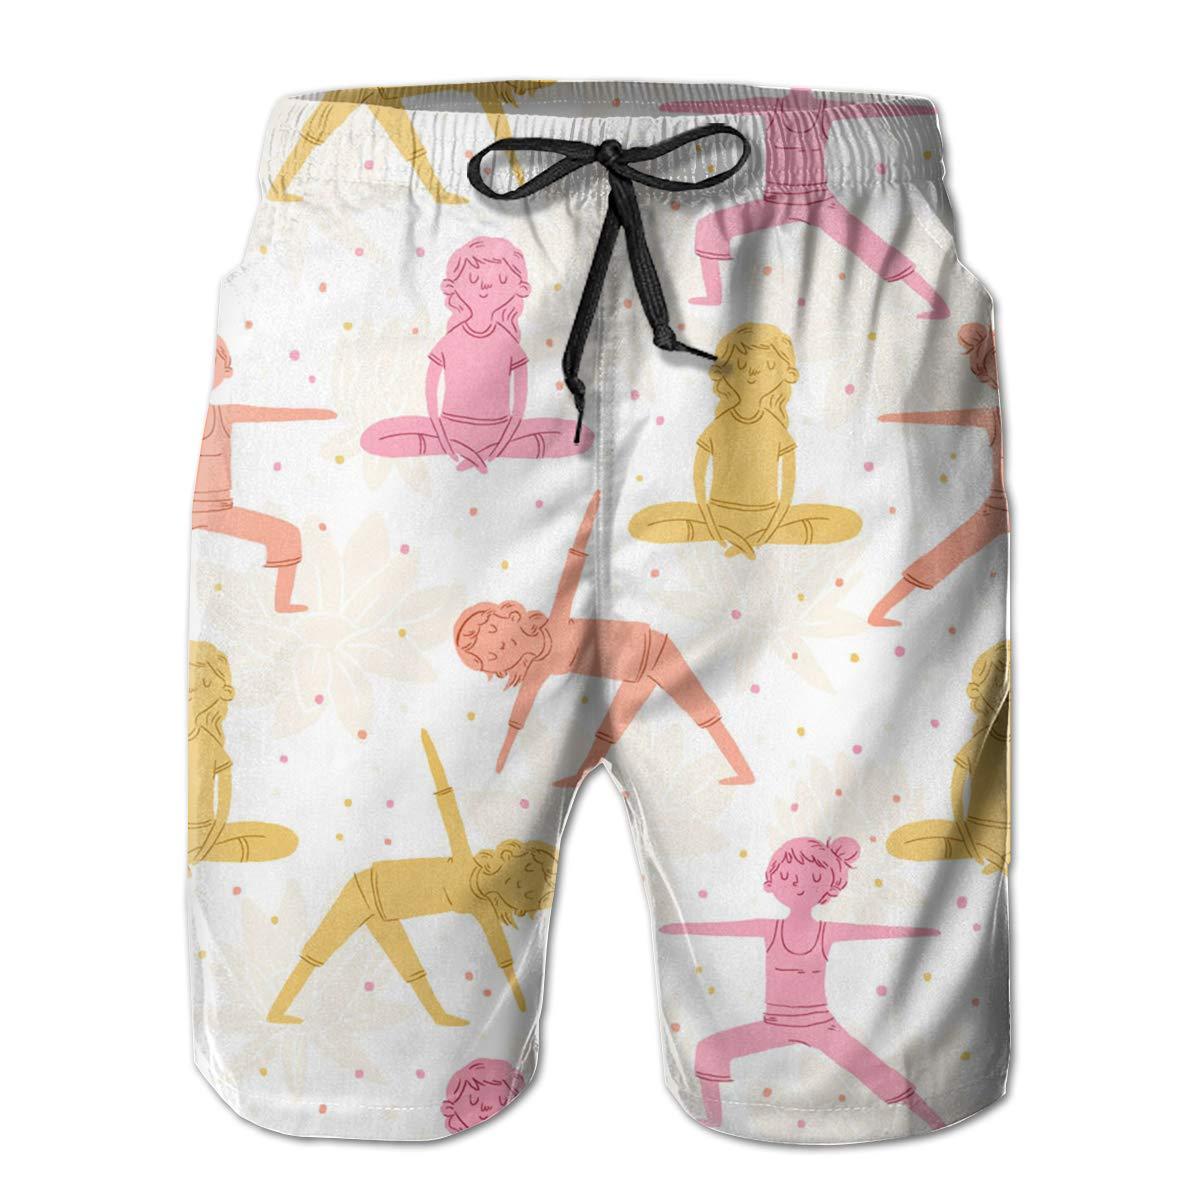 Fancy Illusion Pilates Yoga Cool Boys Mens Shorts Swim Trunks Board Shorts for Men